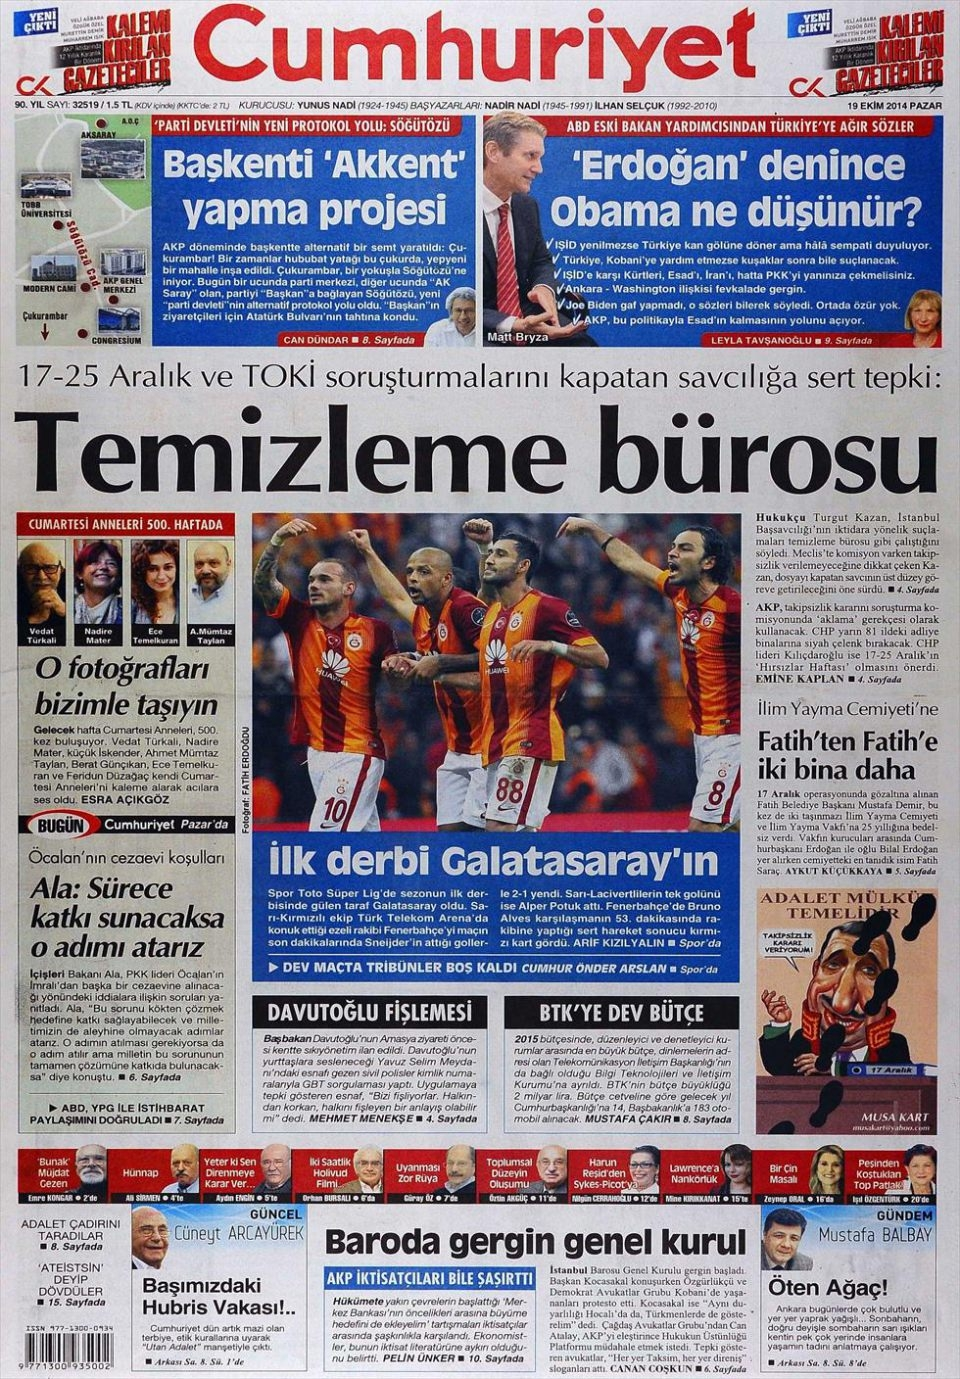 19 Ekim 2014 gazete manşetleri 12